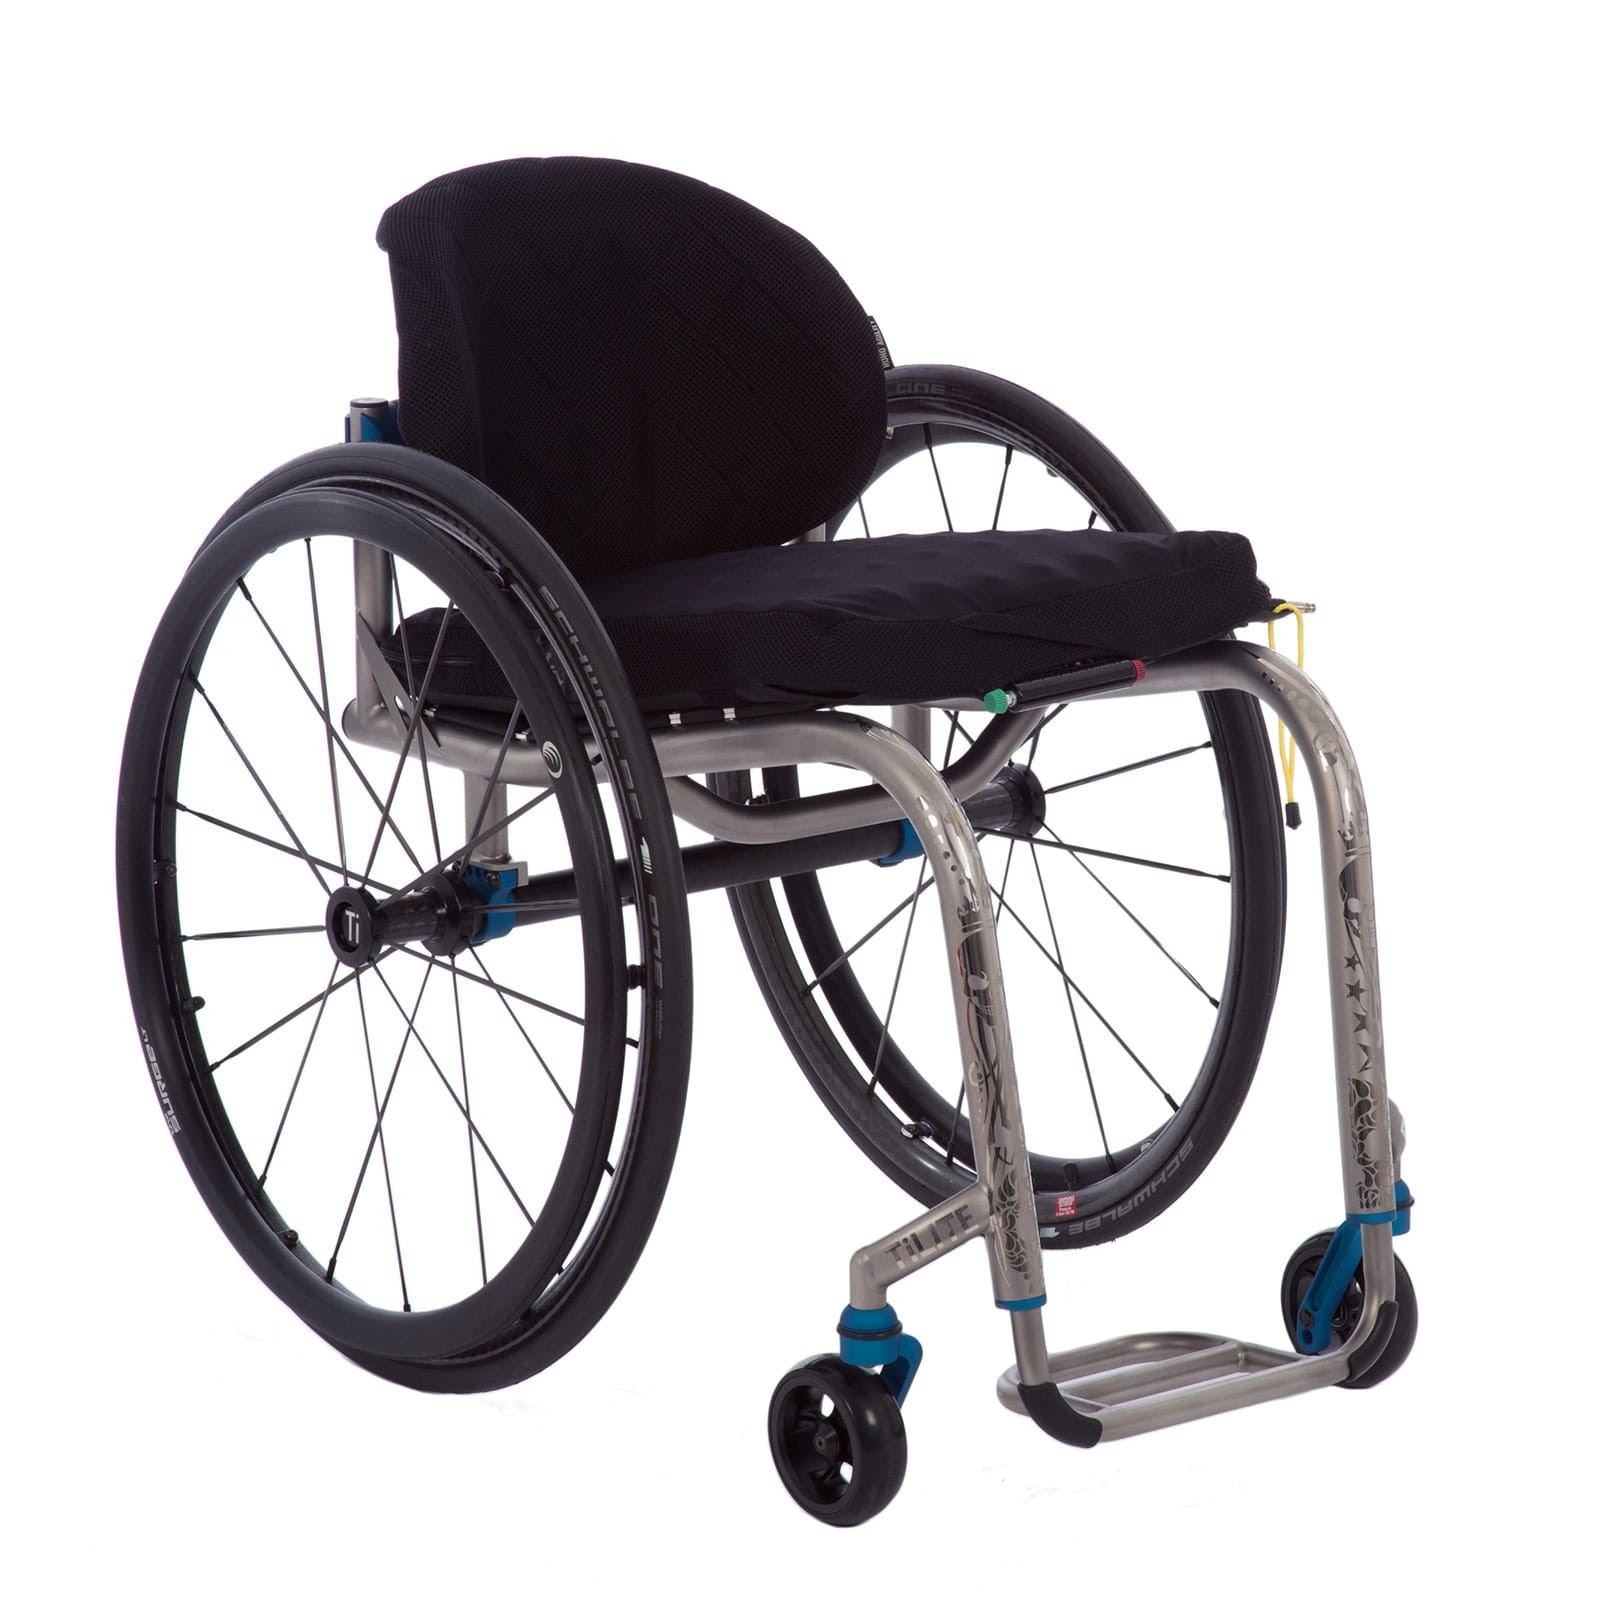 Deluxe Folding & Rigid Ultra Light Wheelchair Rental